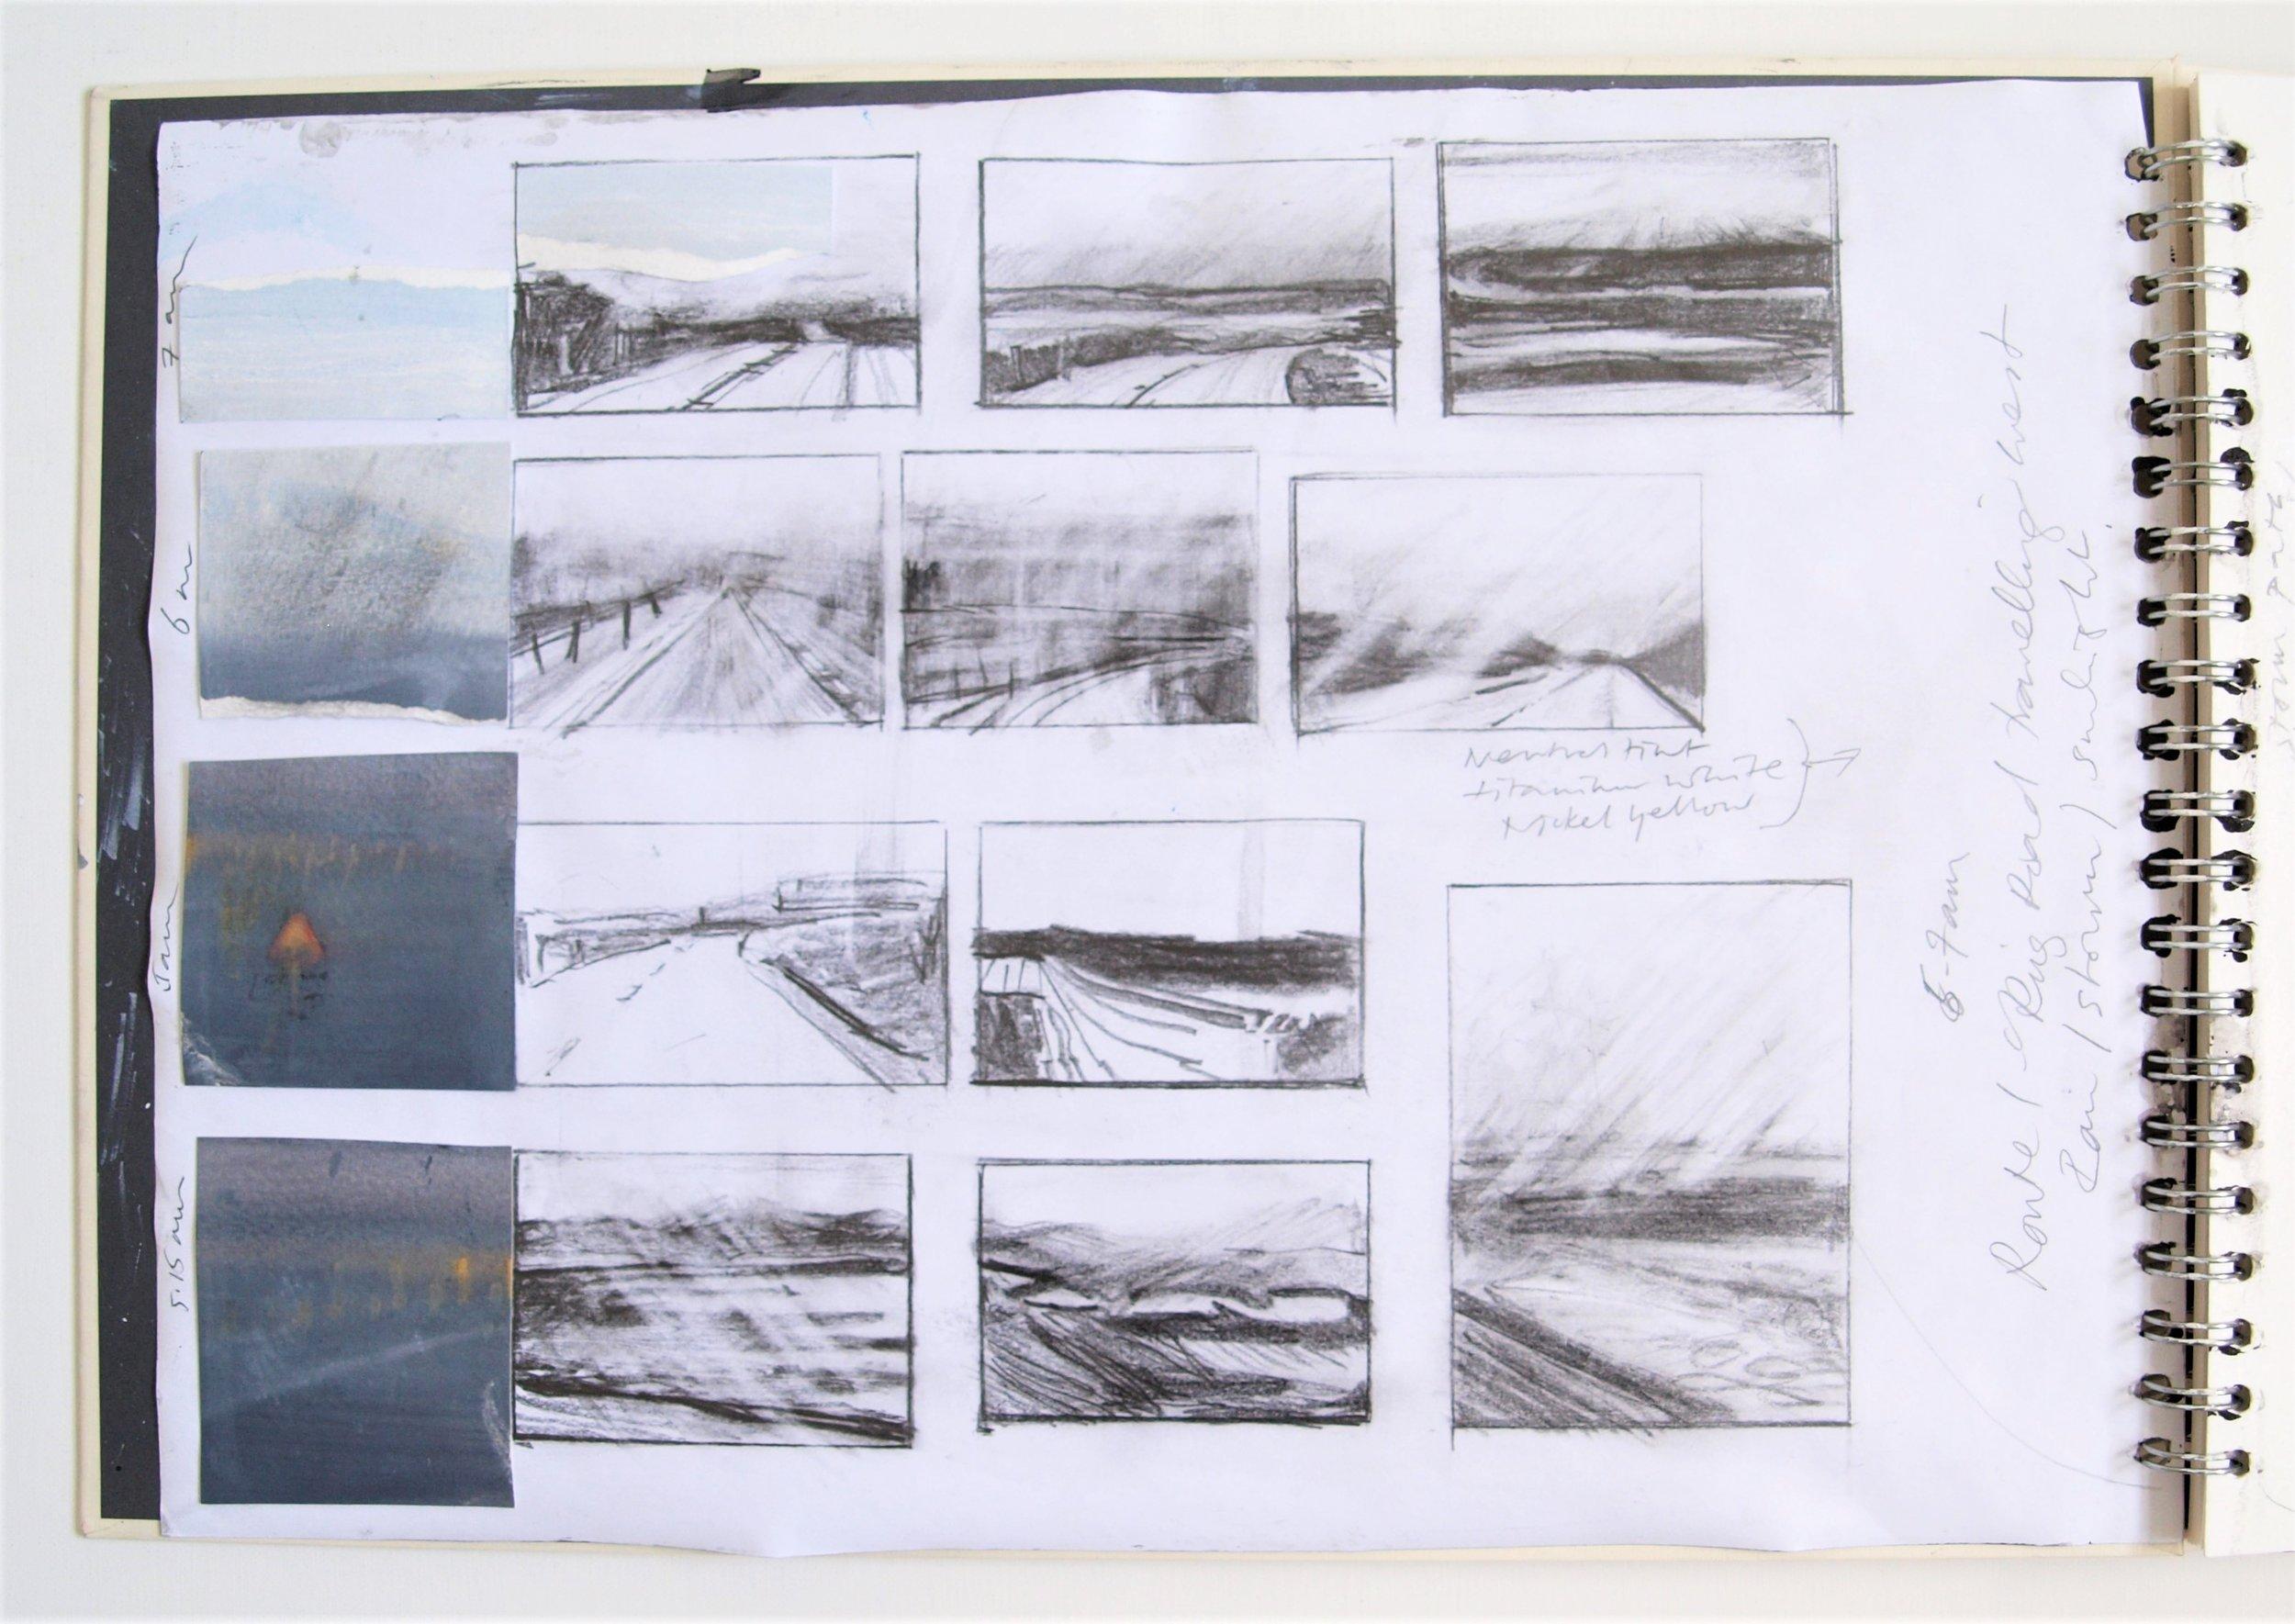 ICELAND LIGHT INTO DARK Sketchbook 2016 (page 1) C.G.GUEST.JPG